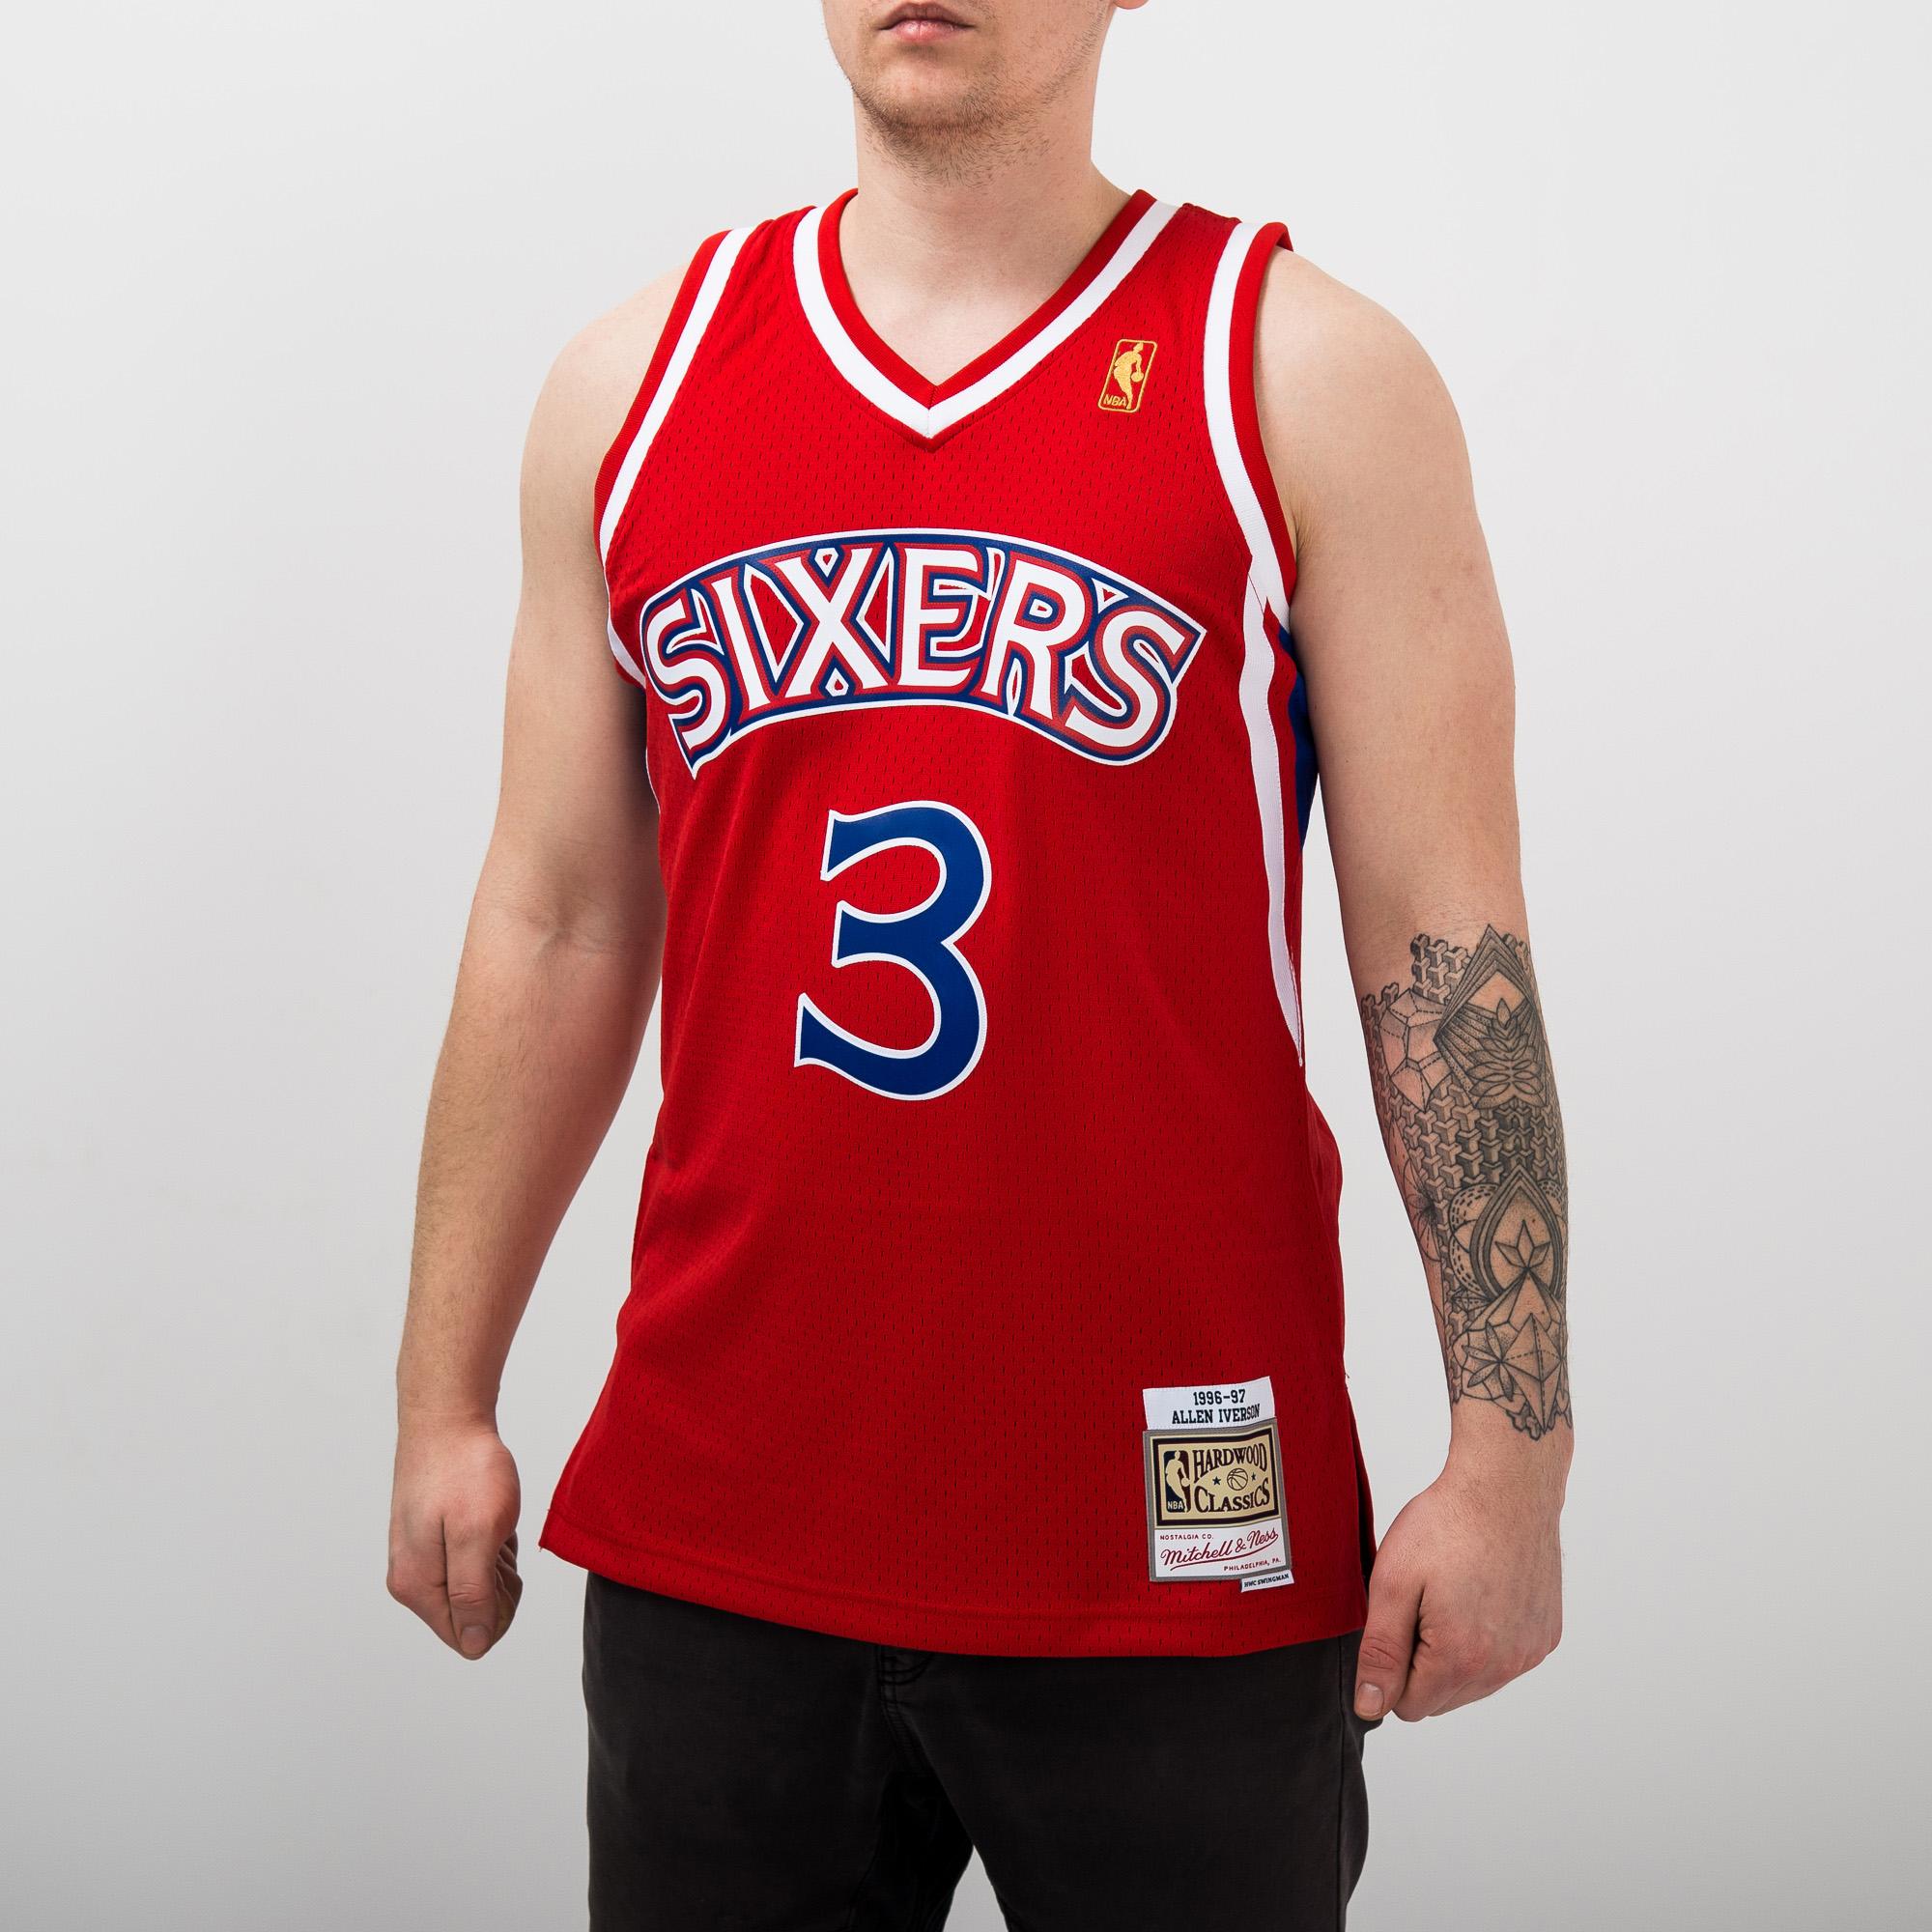 250c4c0a76b8 Mitchell   Ness NBA Philadelphia 76ers Allen Iverson 1996-97 Alternate  Swingman Jersey - NBA Shop Philadelphia 76ers Merchandise - Superfanas.lt